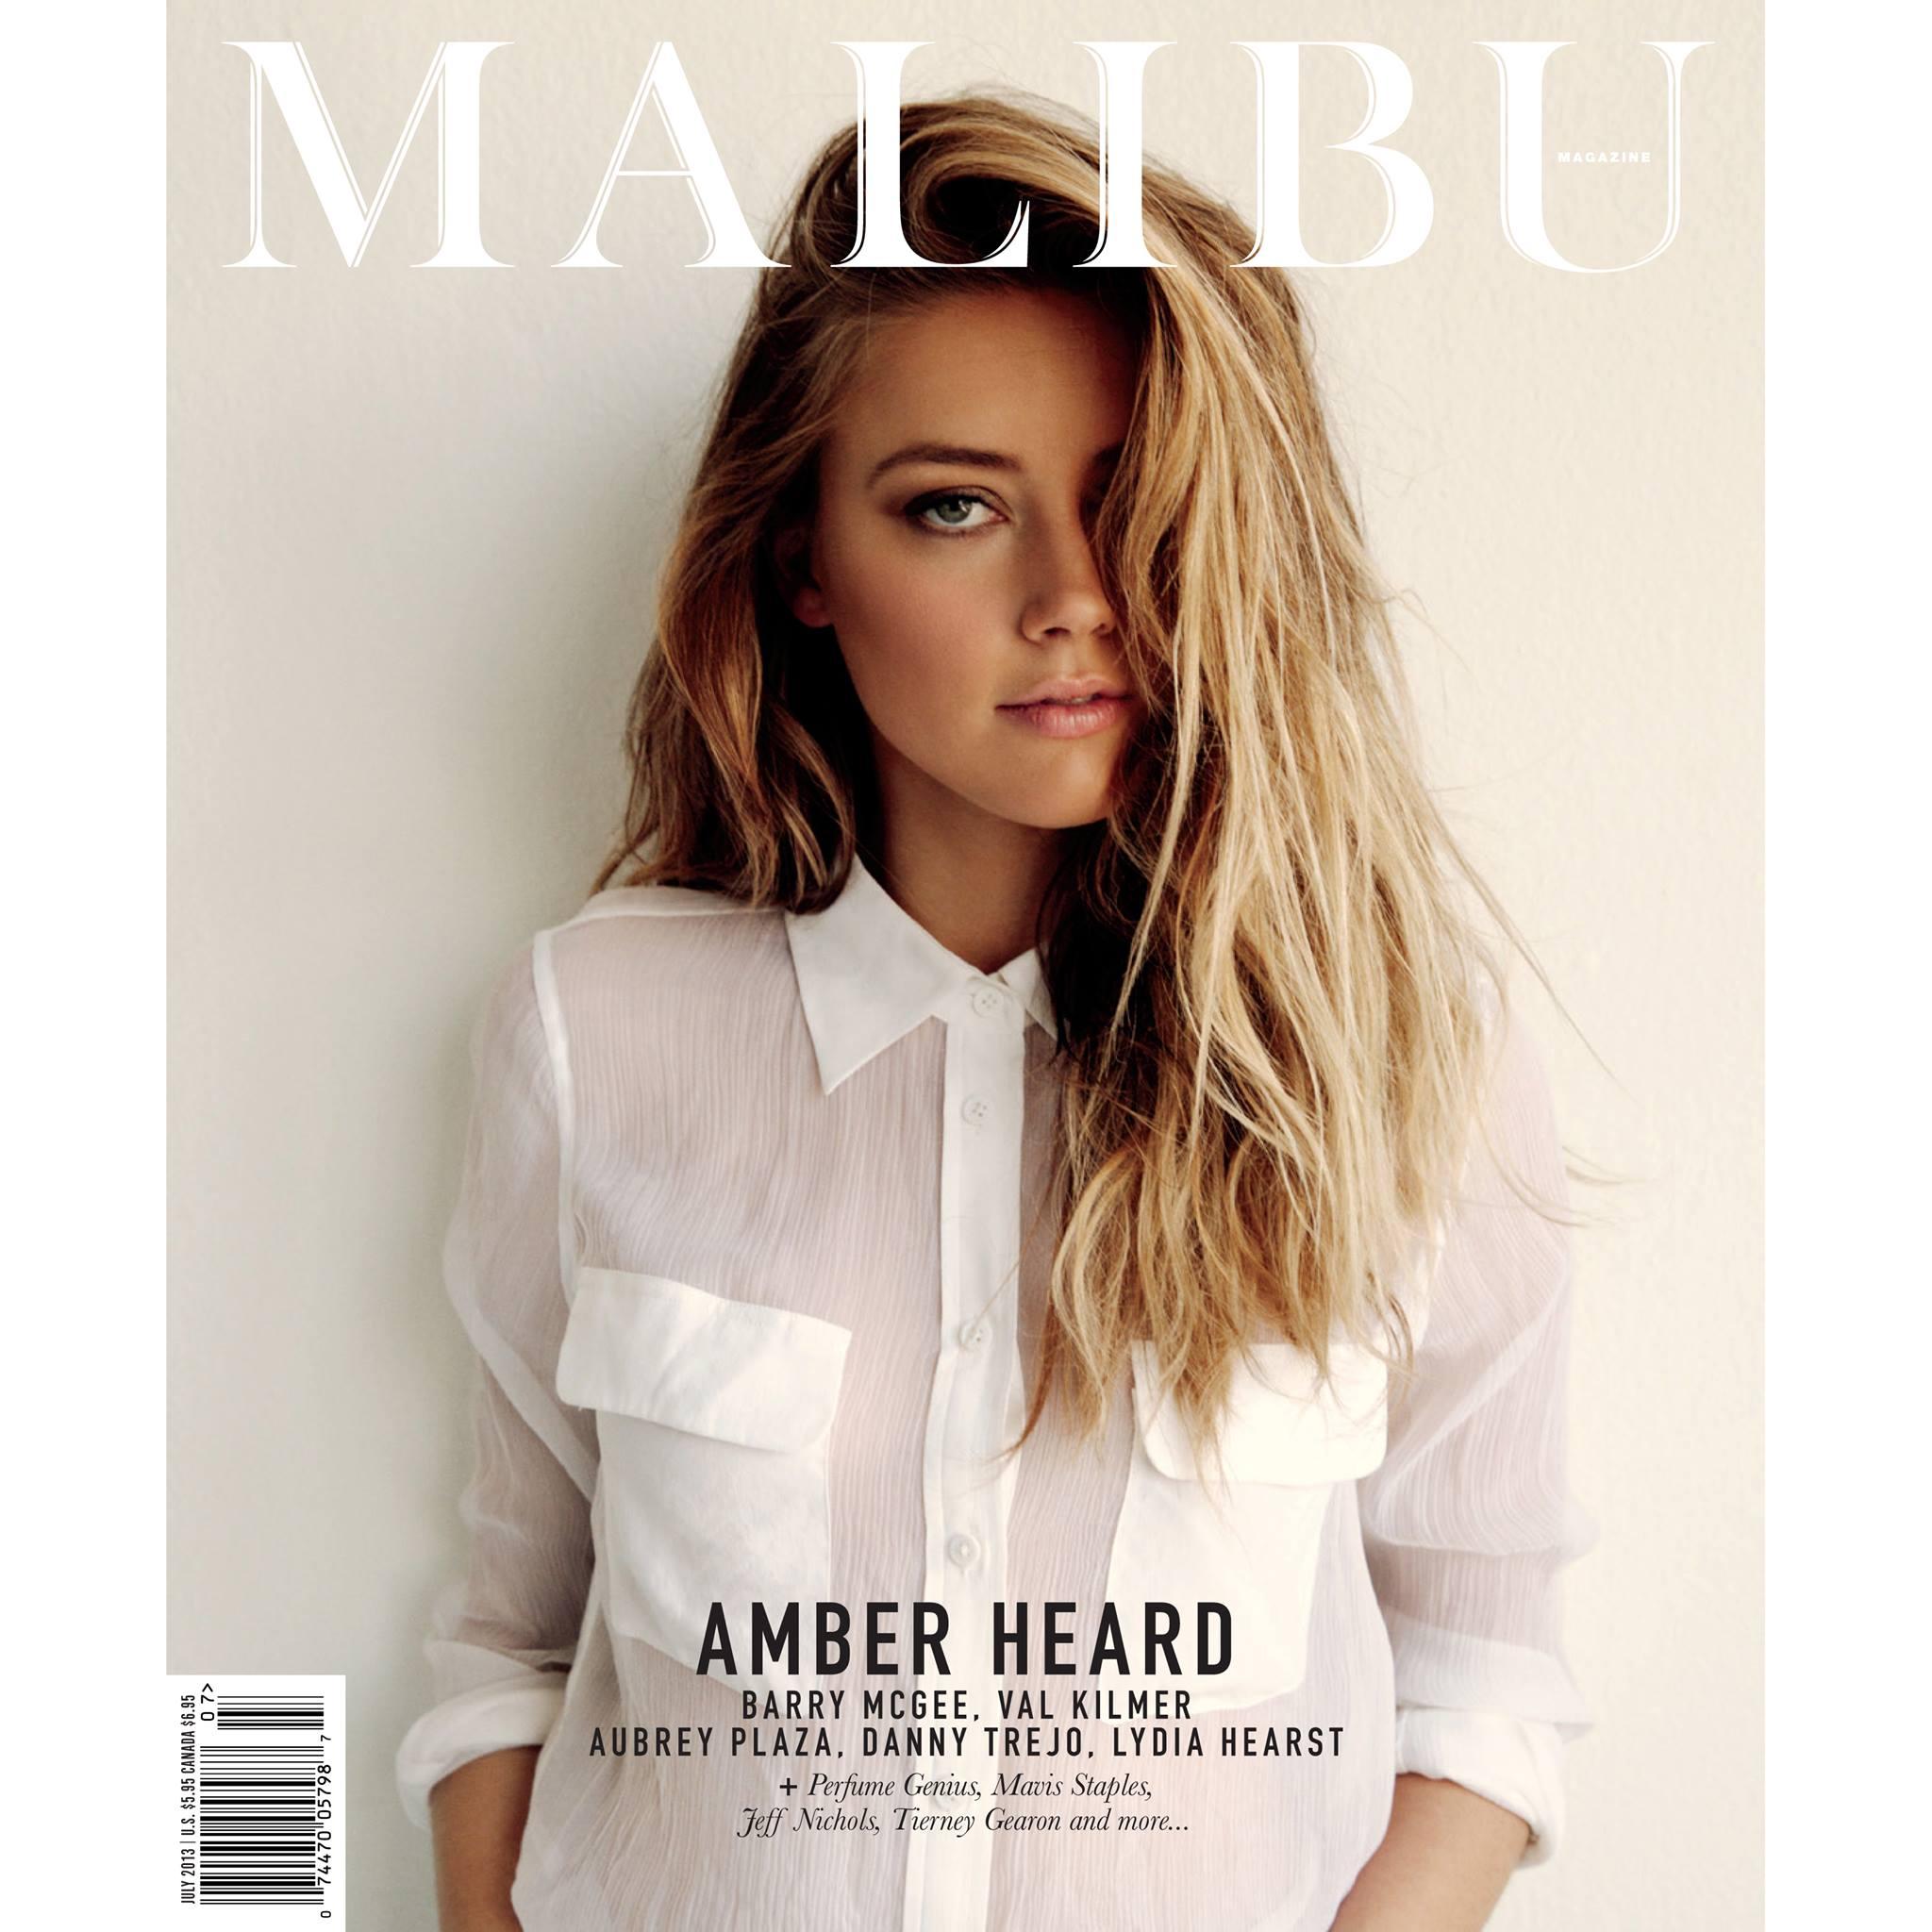 Amber Heard Looks Stunning In Malibu Magazine